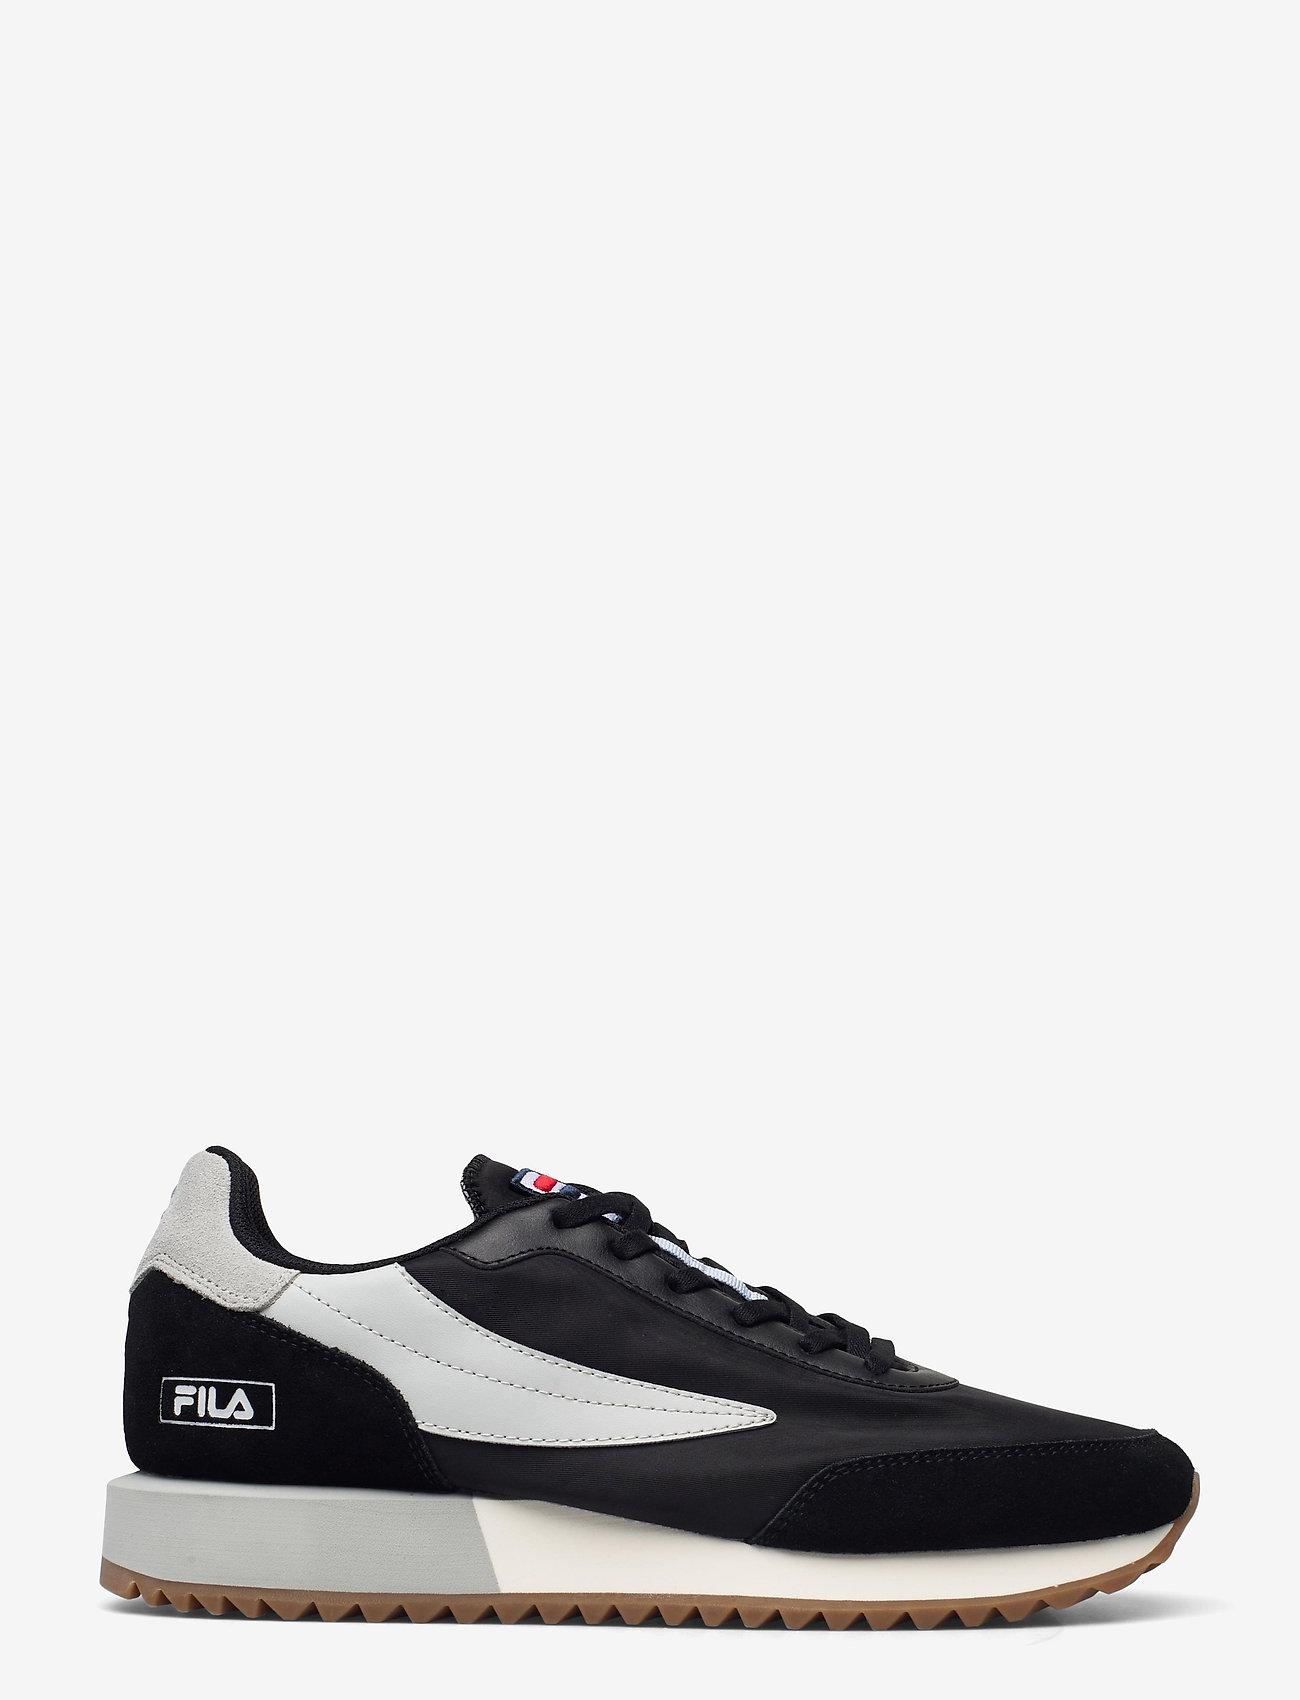 FILA - Retronique - baskets basses - black / gray violet - 1